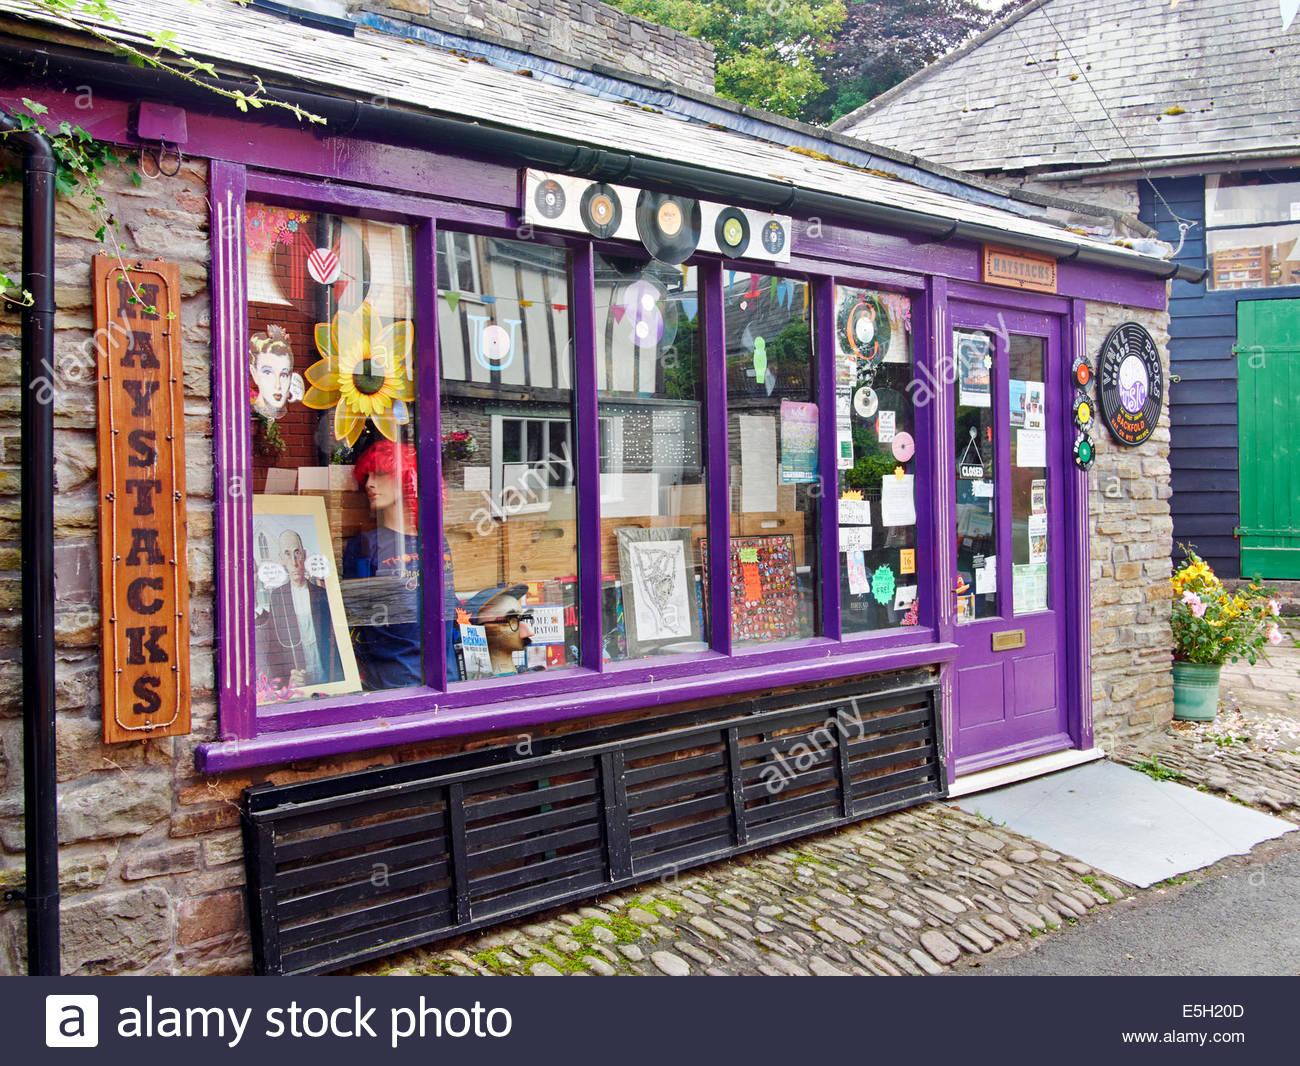 backfold haystacks record shop in hay on wye - Stock Image